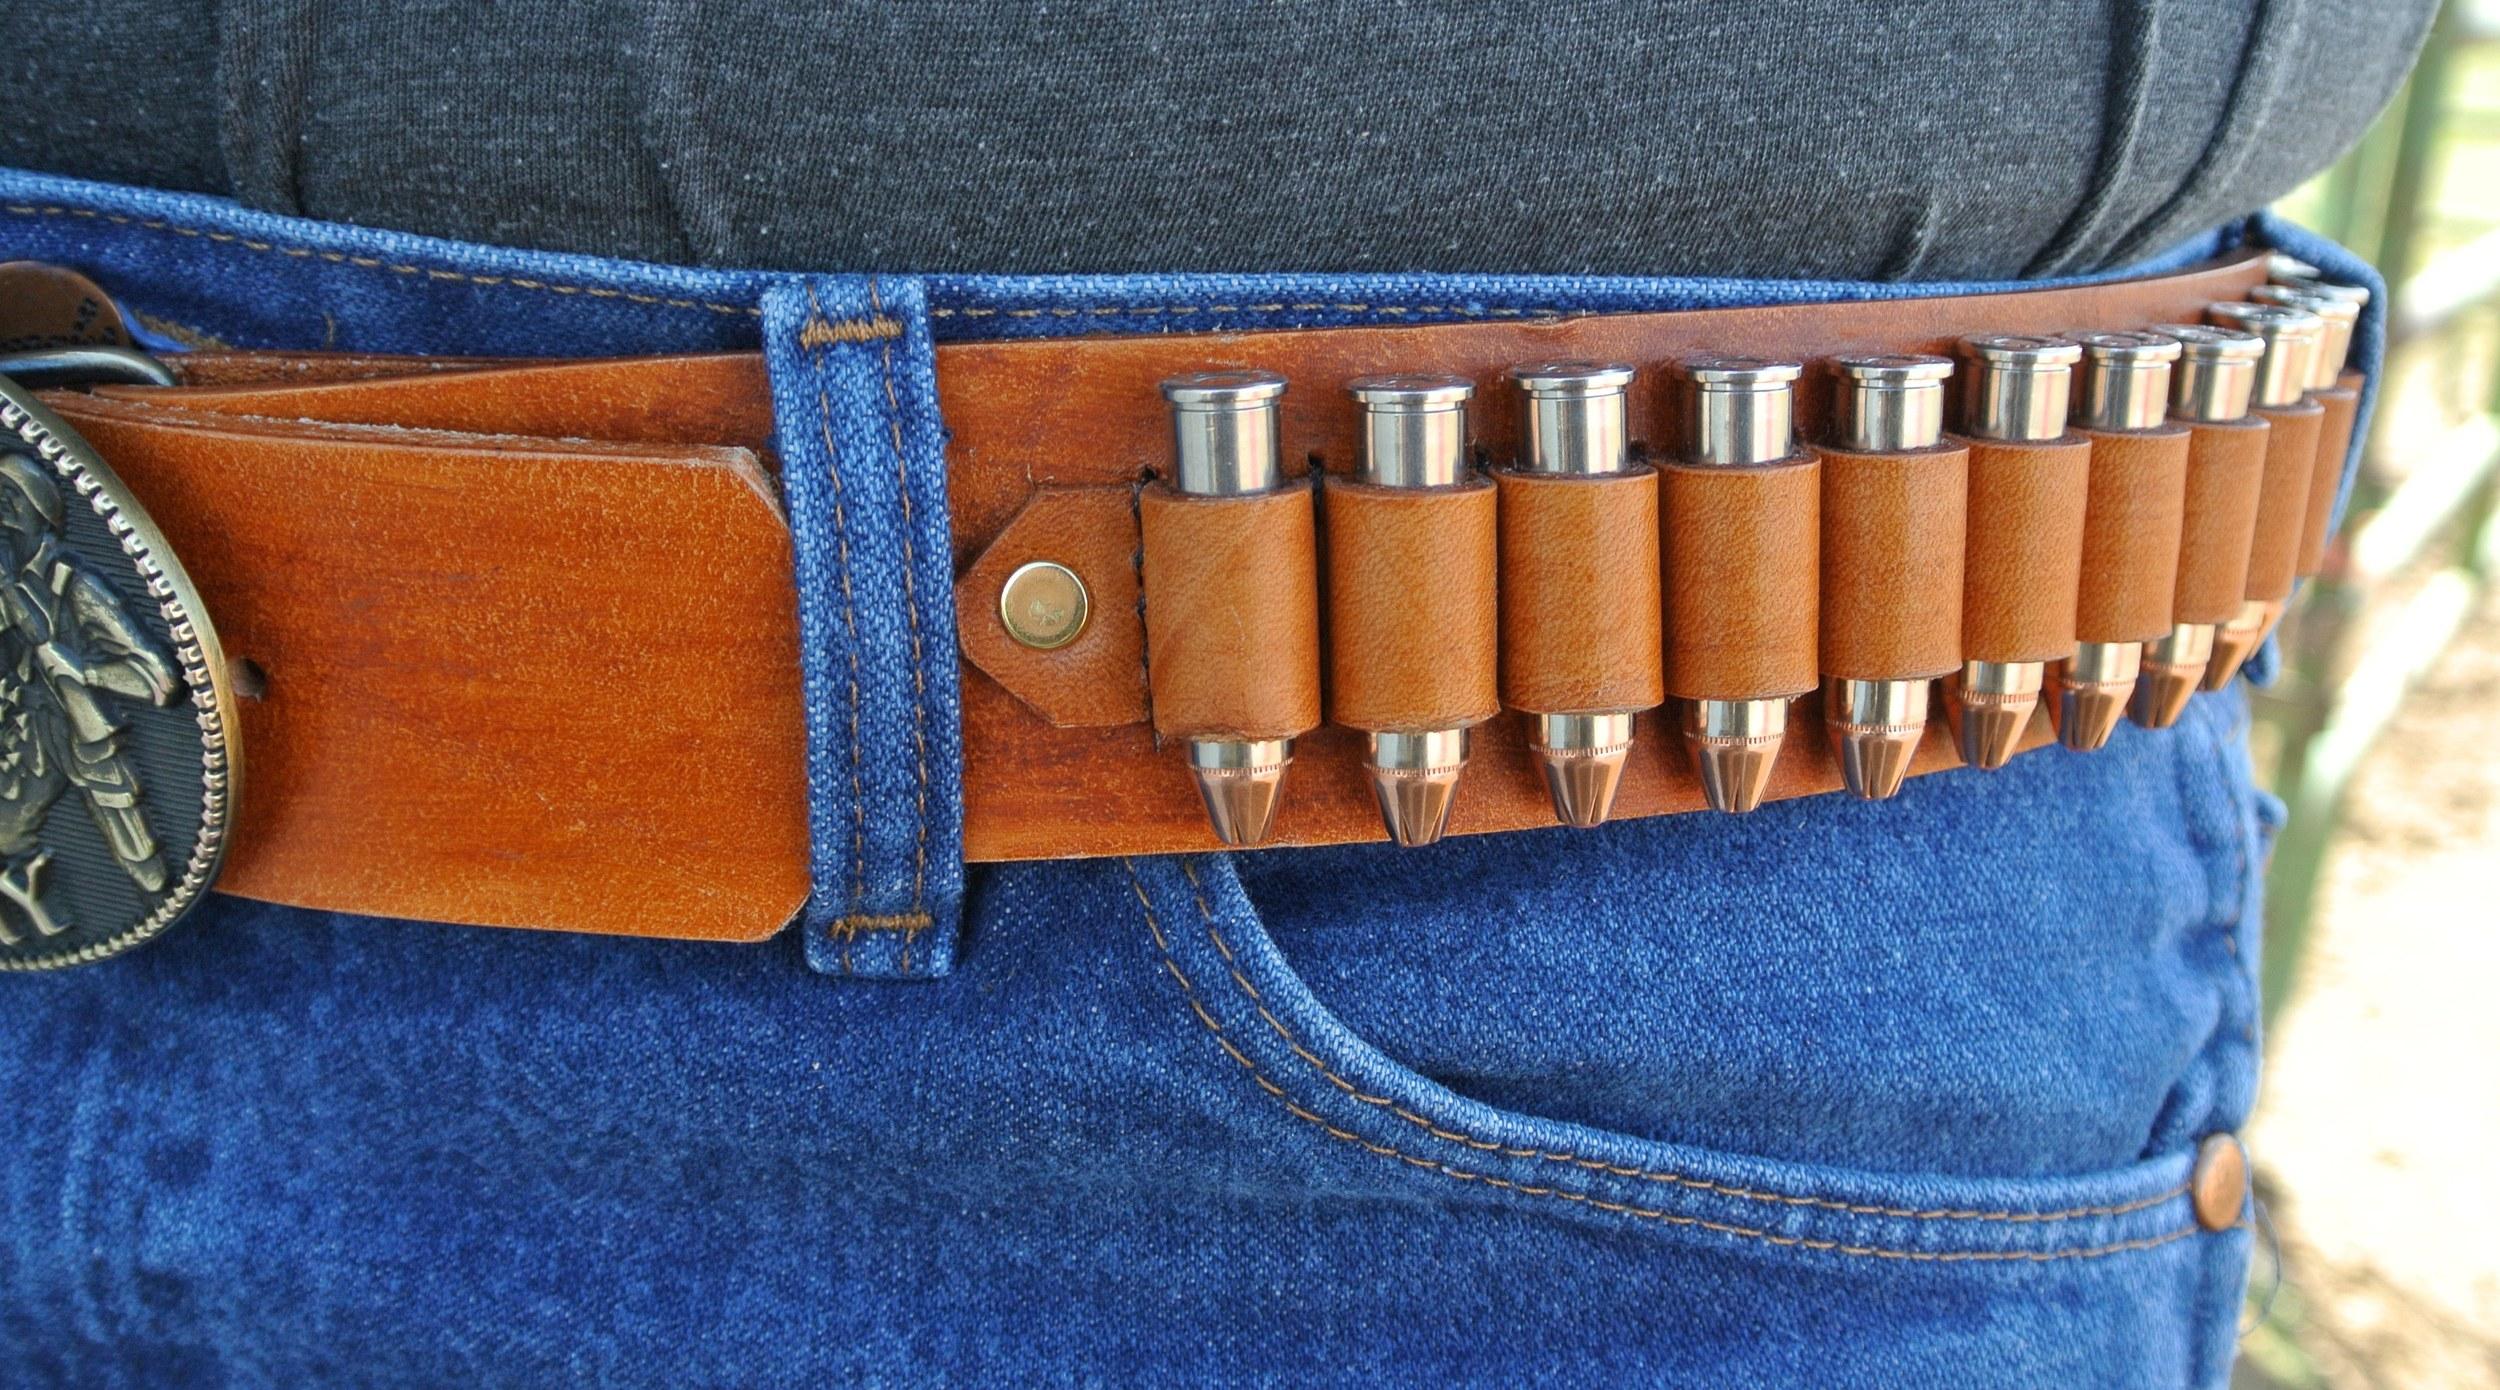 Leather Belt - Cartridge Holder!